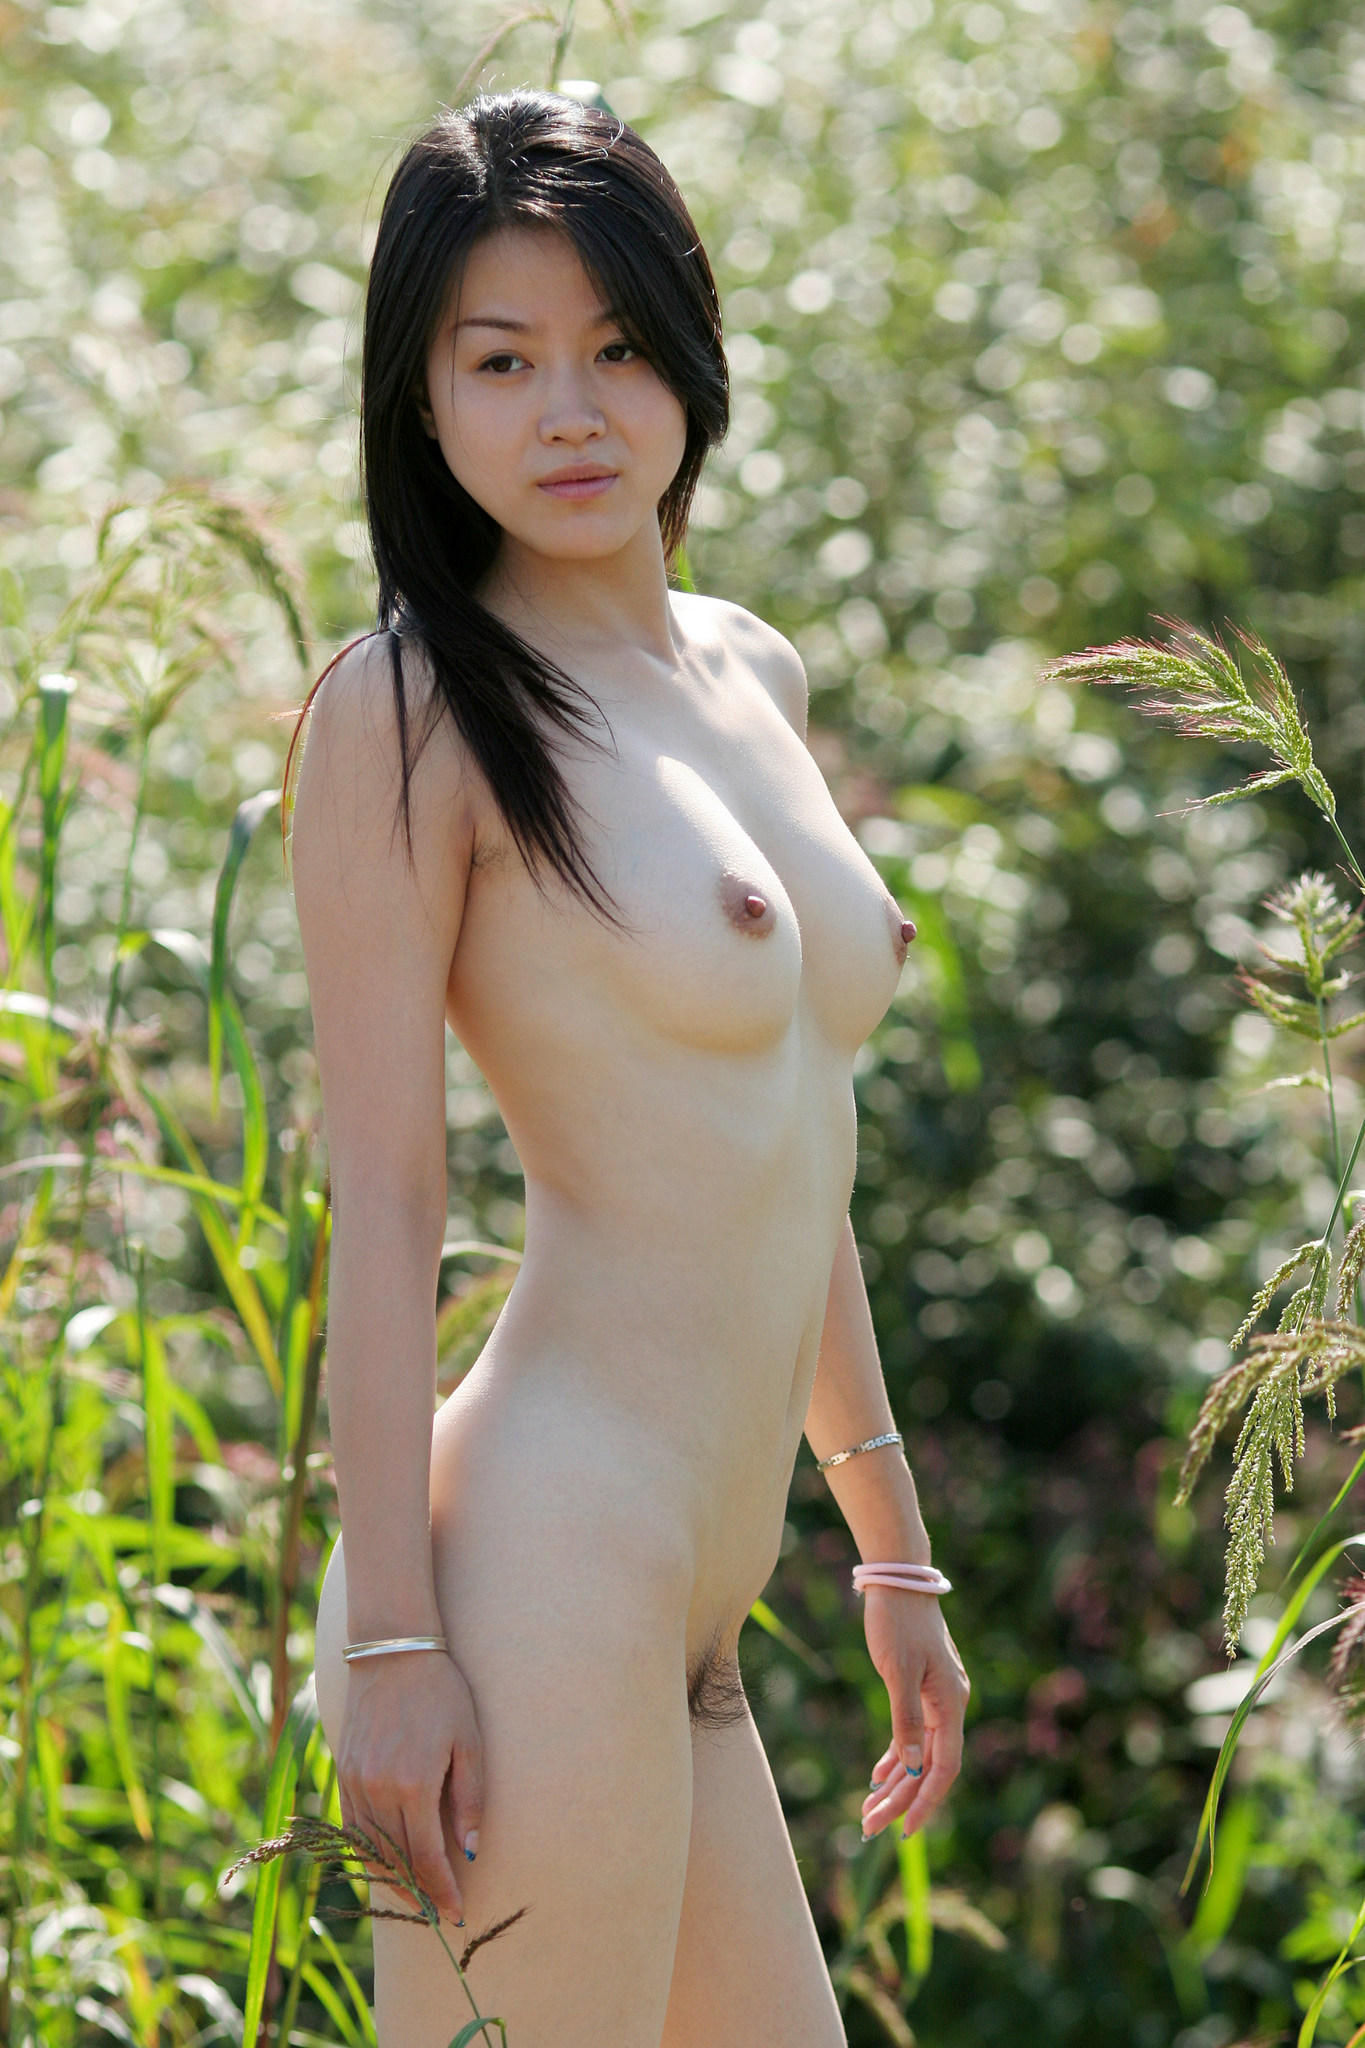 голые бабы фото китаянки - 14